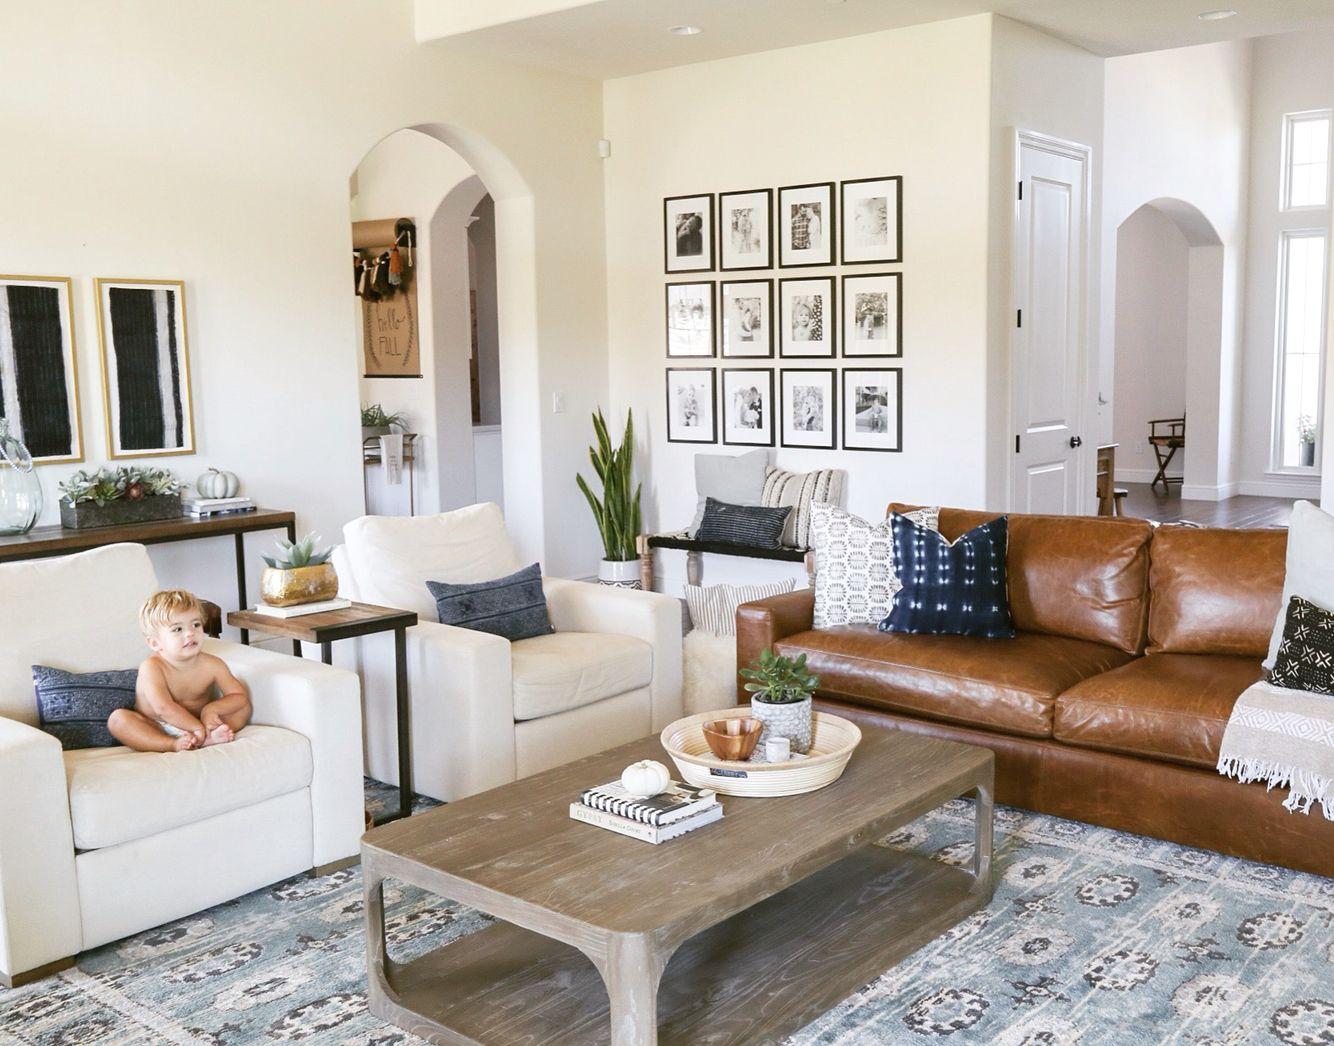 Living room decor, interior design, traditional, modern